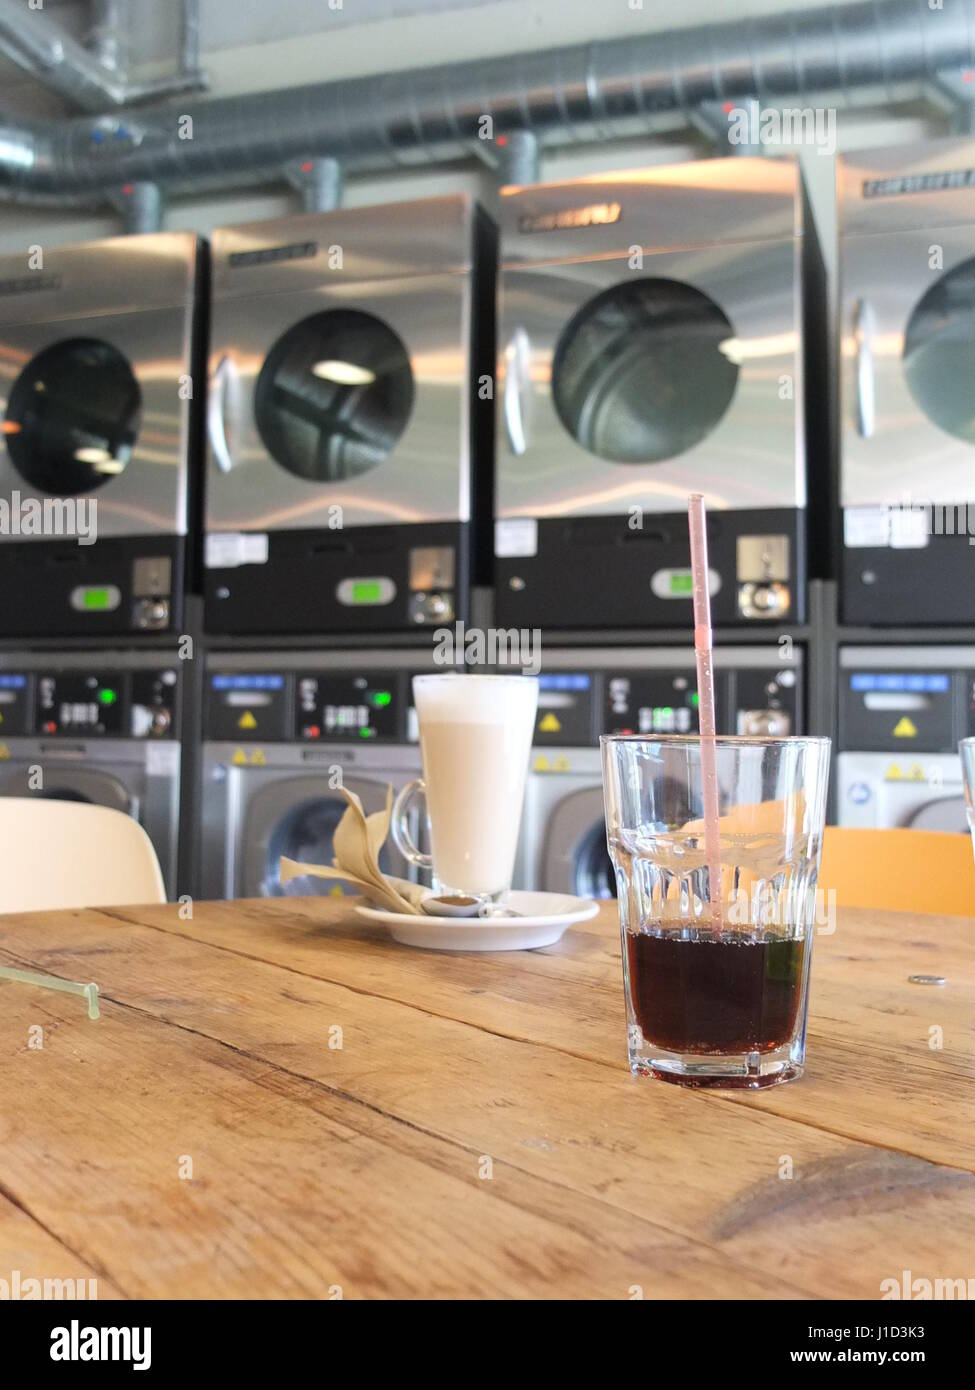 Mr Bubbles, a combined laundrette (laundromat) and café in Sheffield - Stock Image